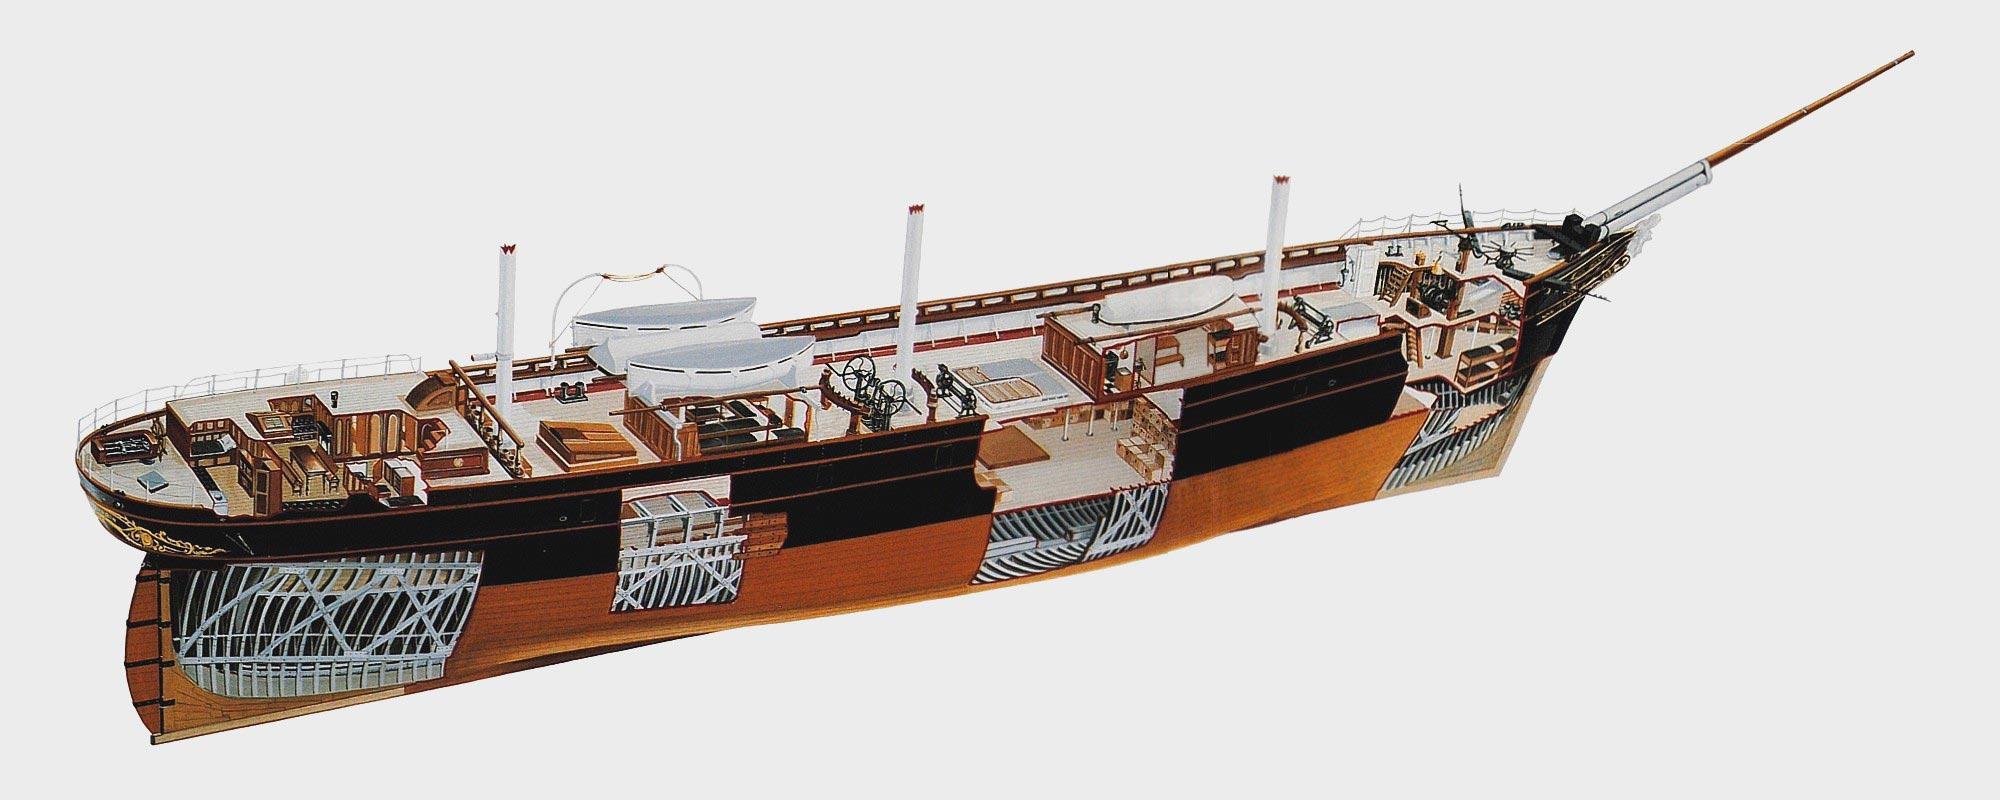 Cutty Sark clipper ship cutaway